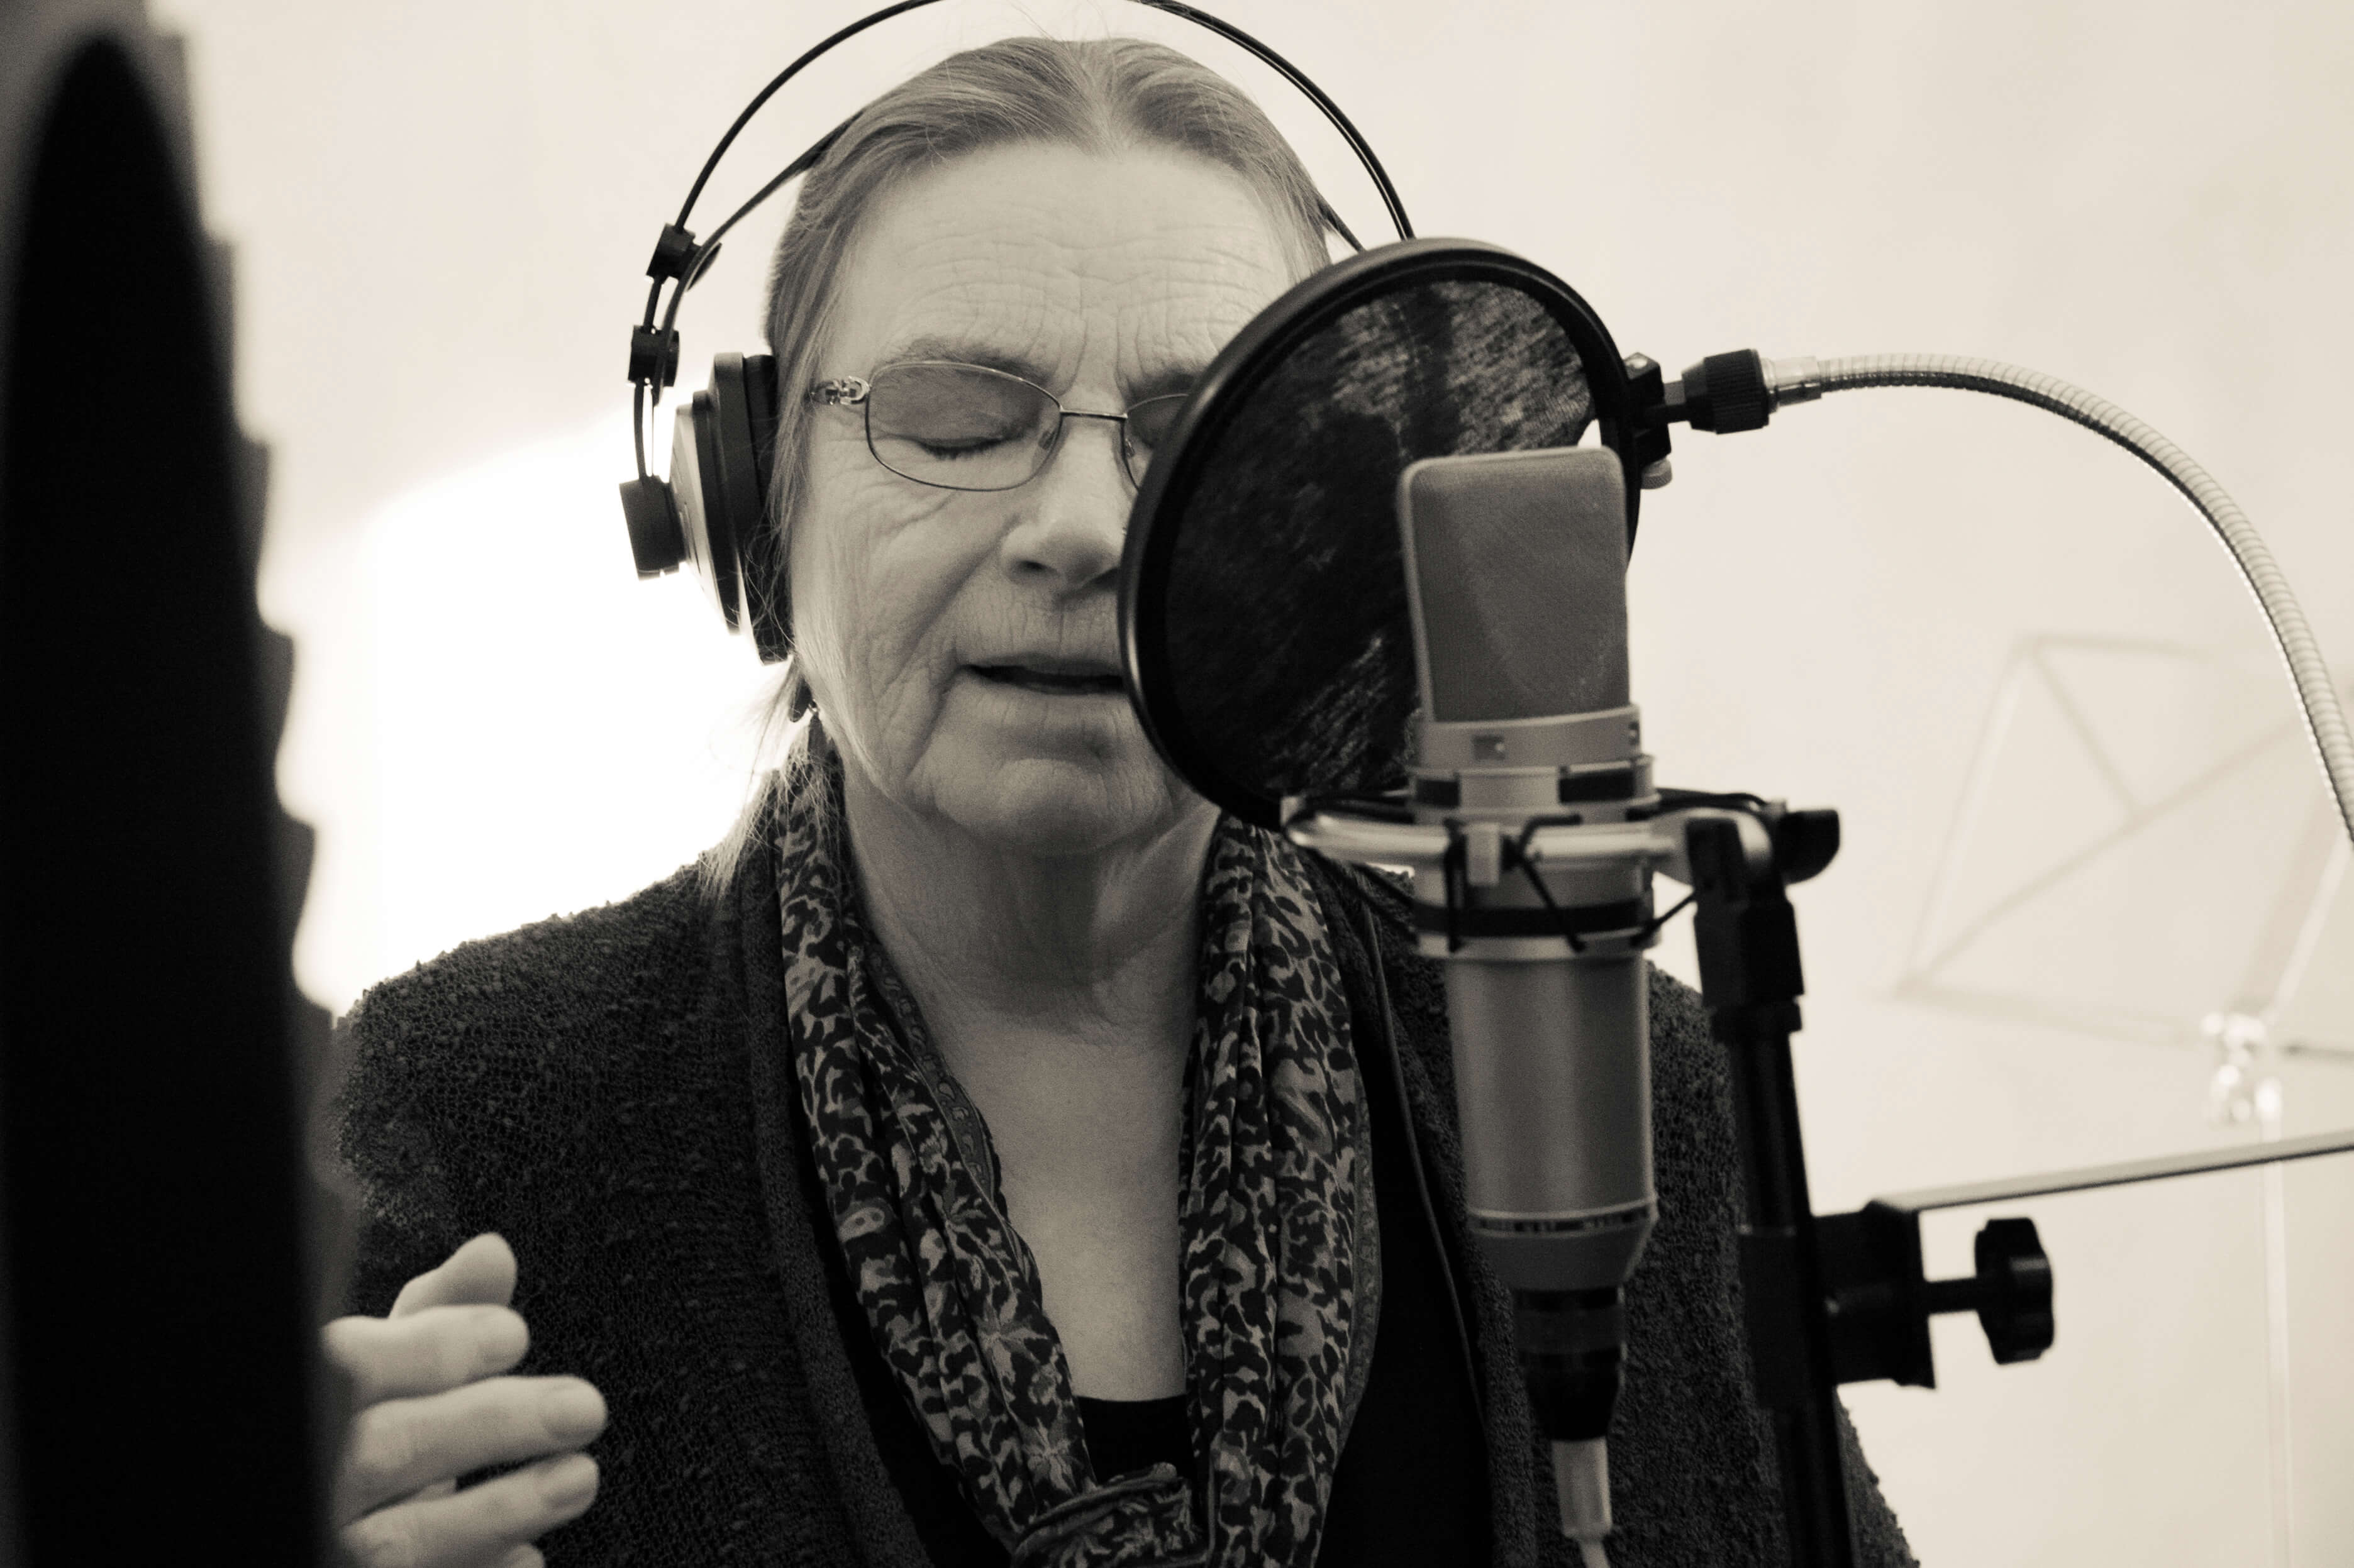 Valerie singing in studio